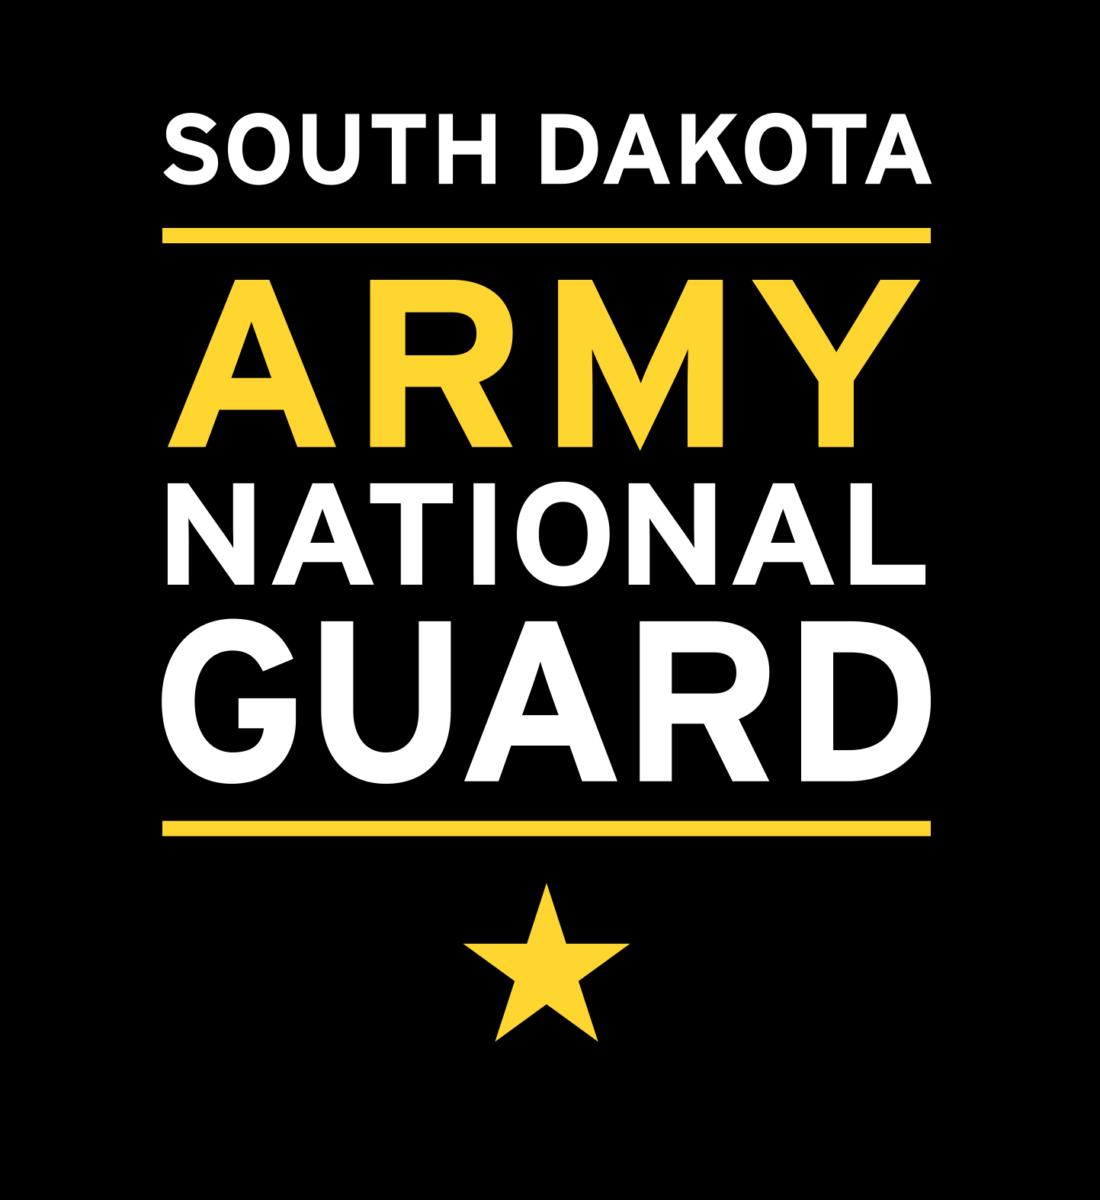 South Dakota Army National Guard